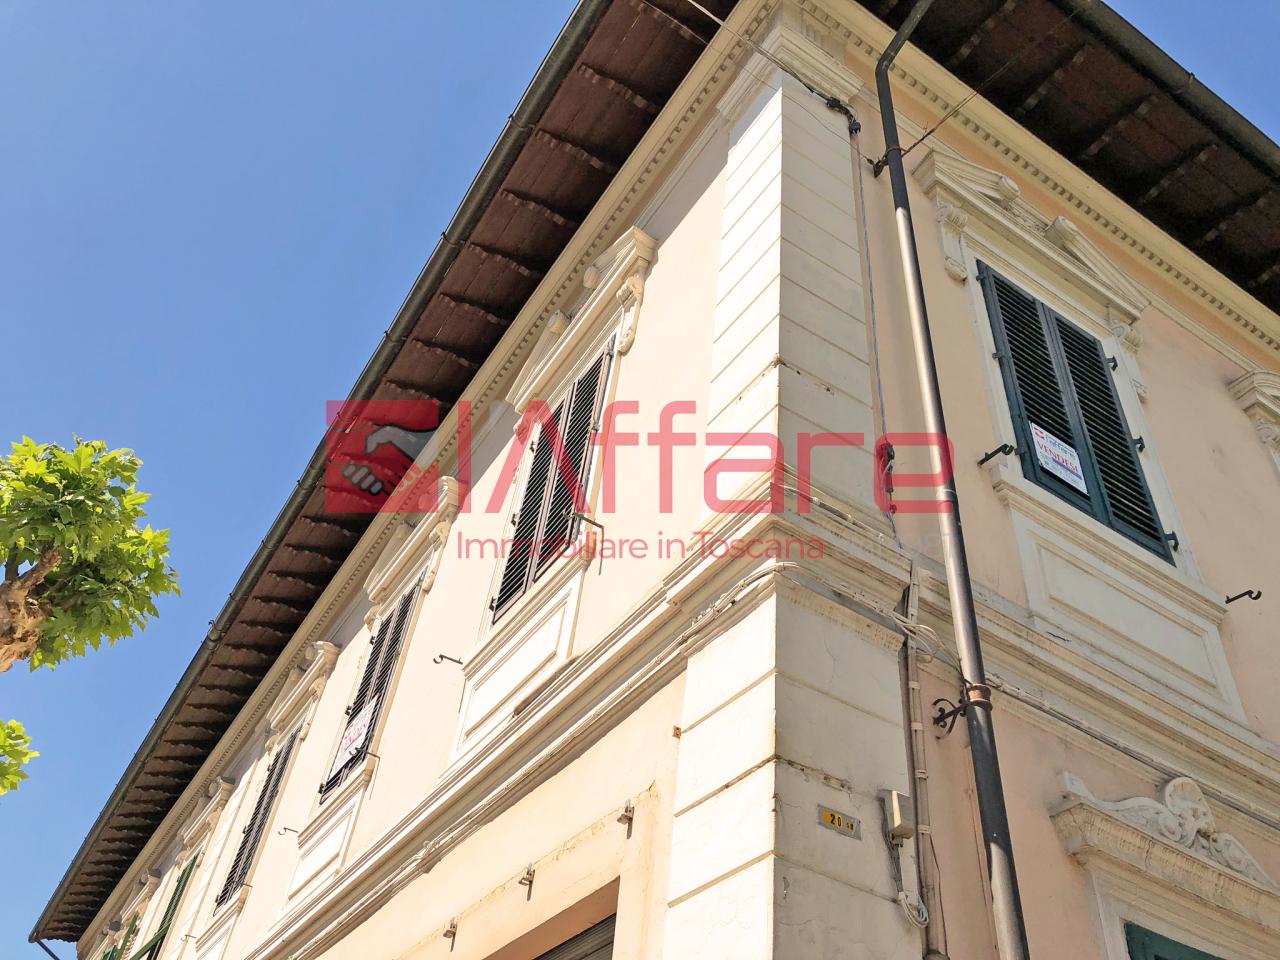 Montecatini-Terme (1/5)